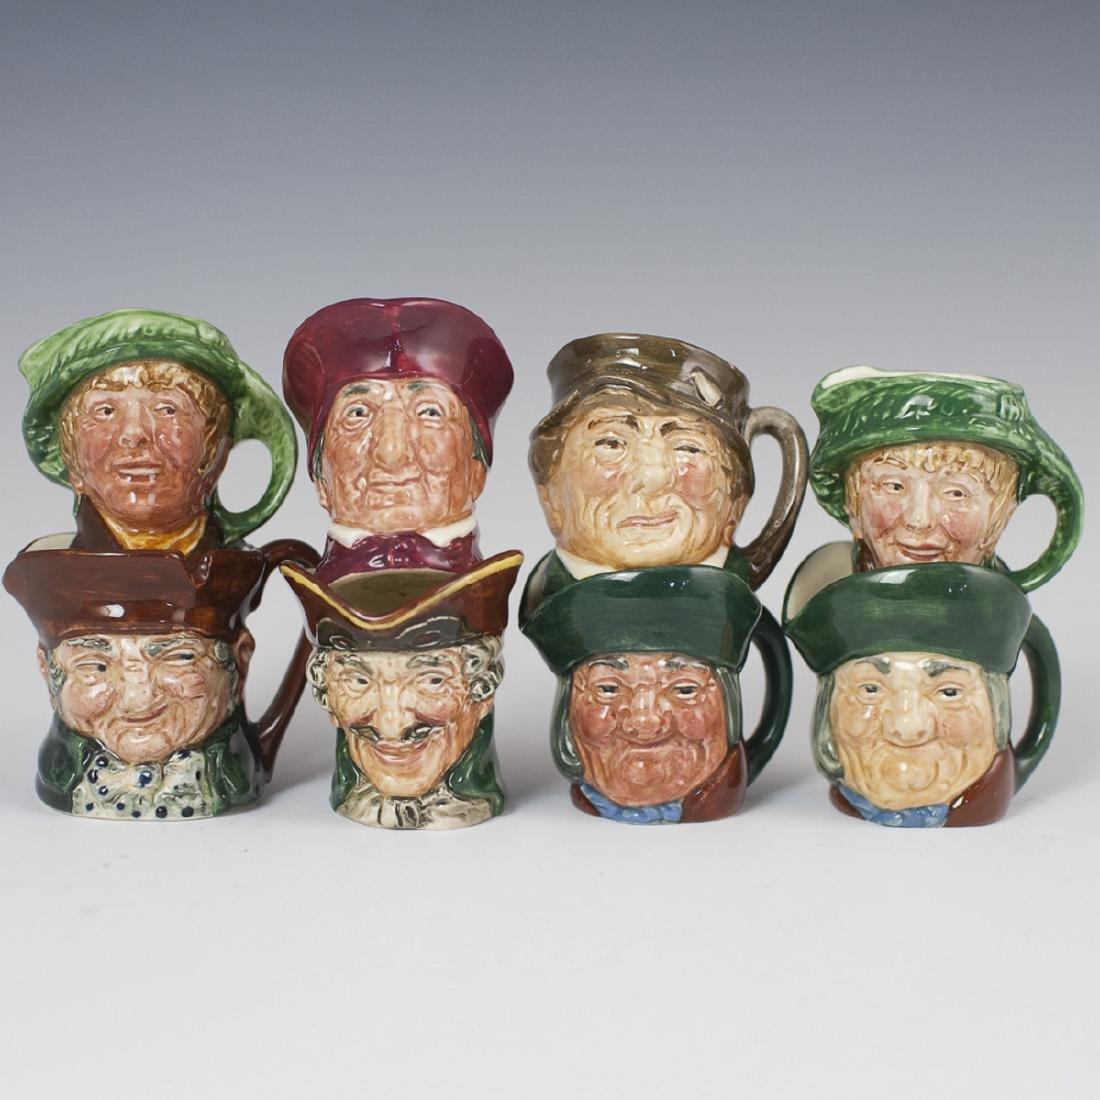 Royal Doulton Figural Mugs